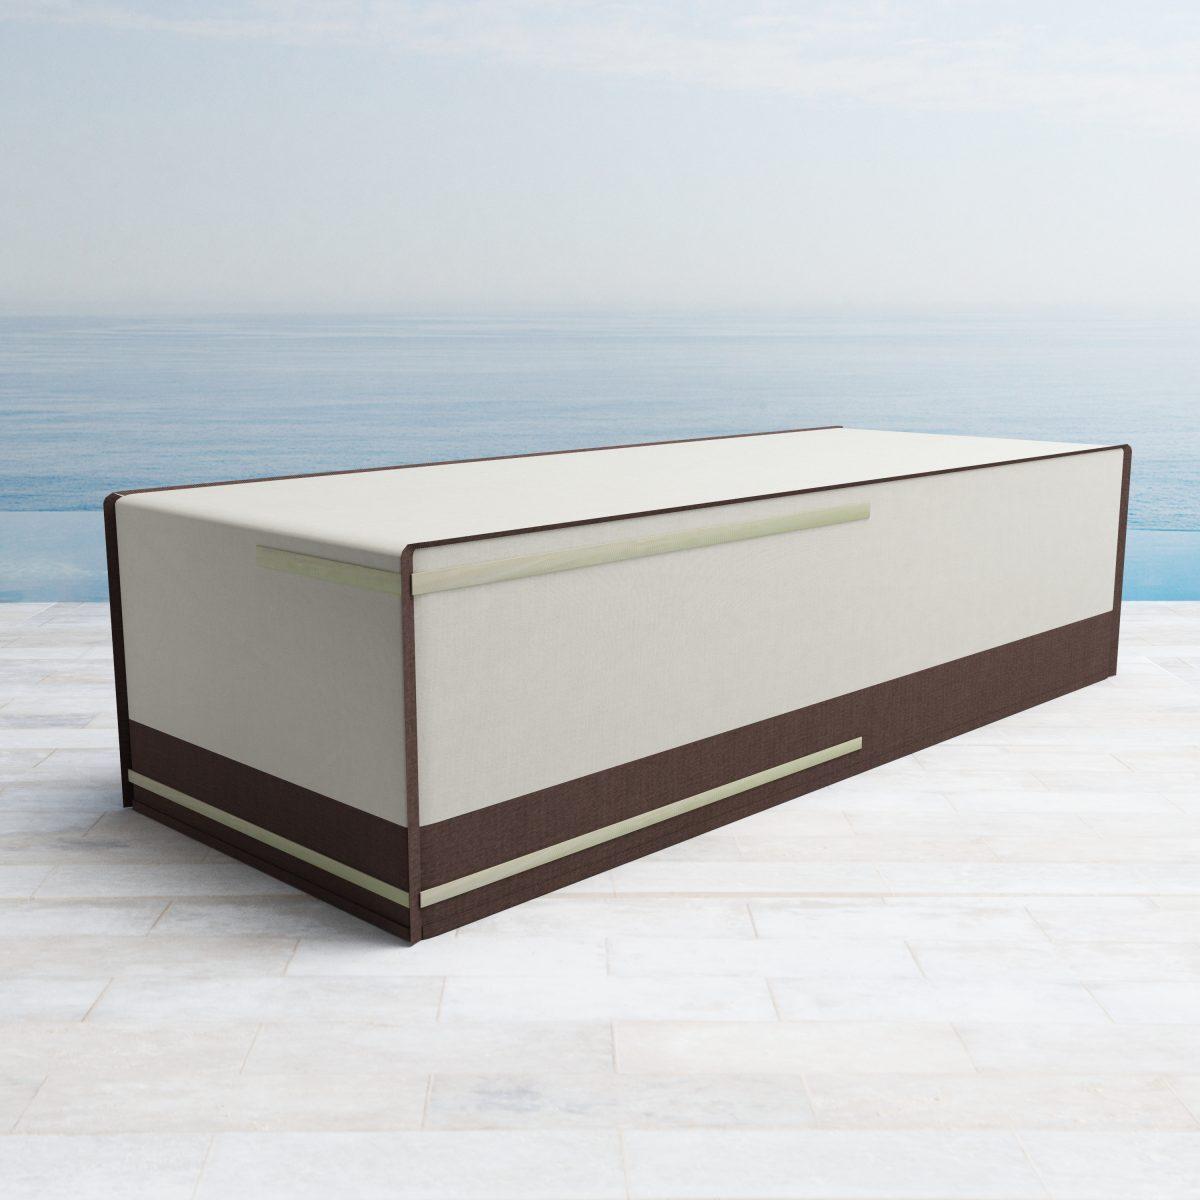 Sirio X Large Multi Purpose Cover For Outdoor Furniture